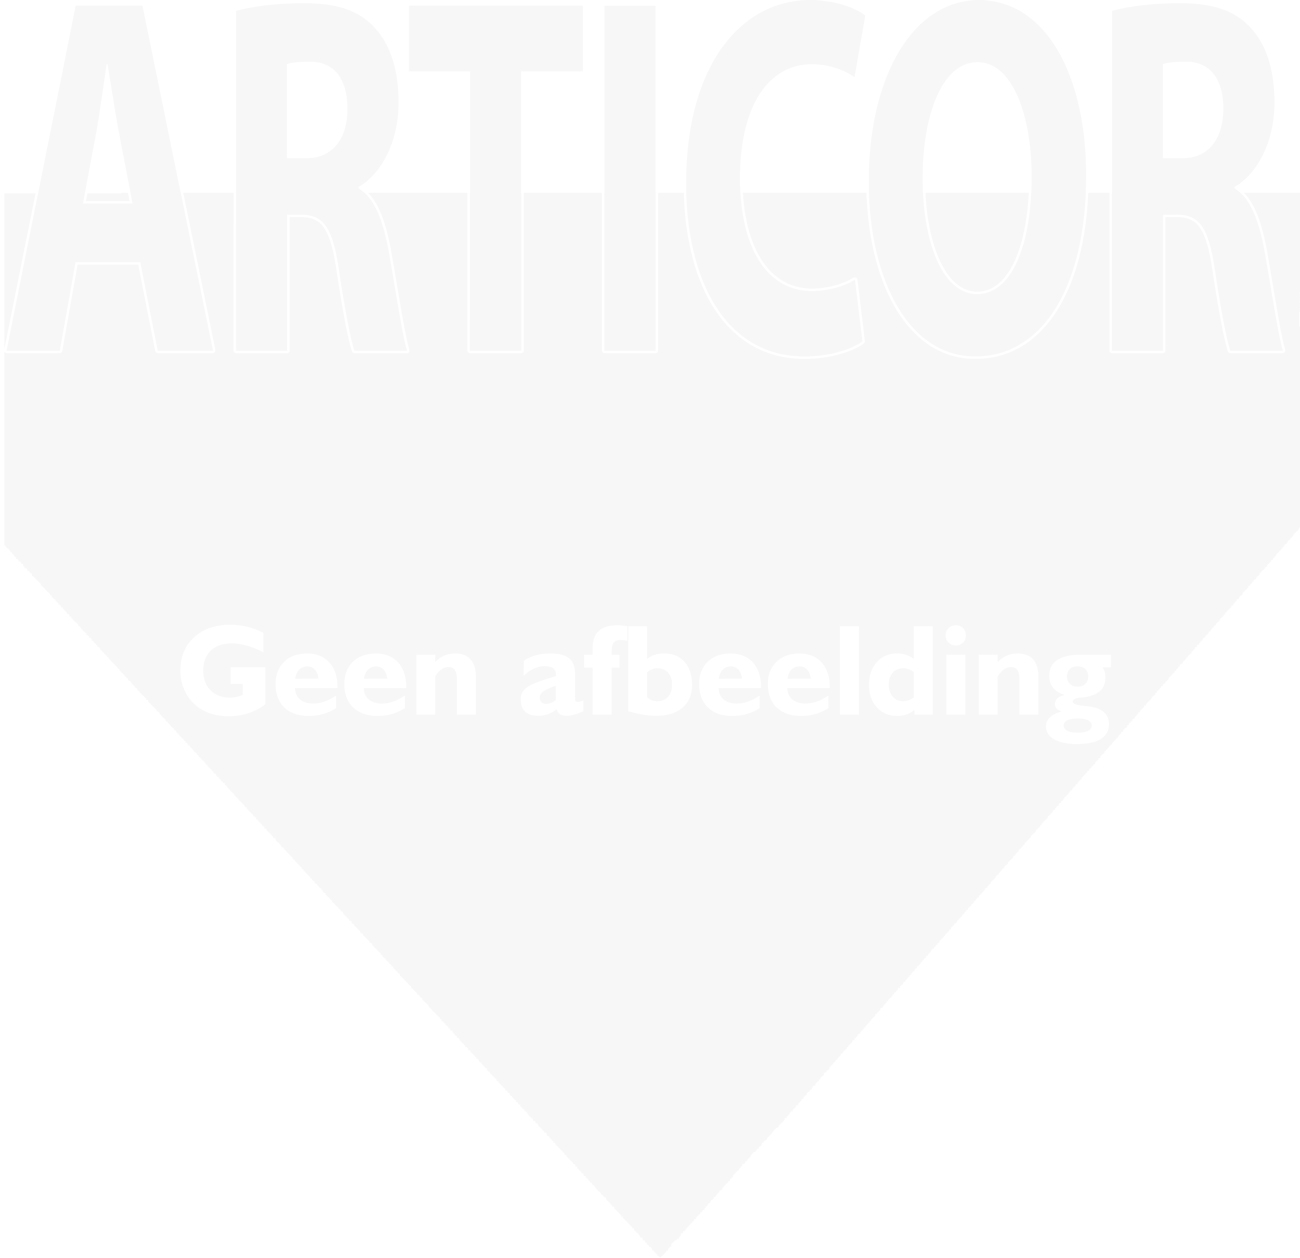 Airbrushkleurstof Geel Azo Vrij